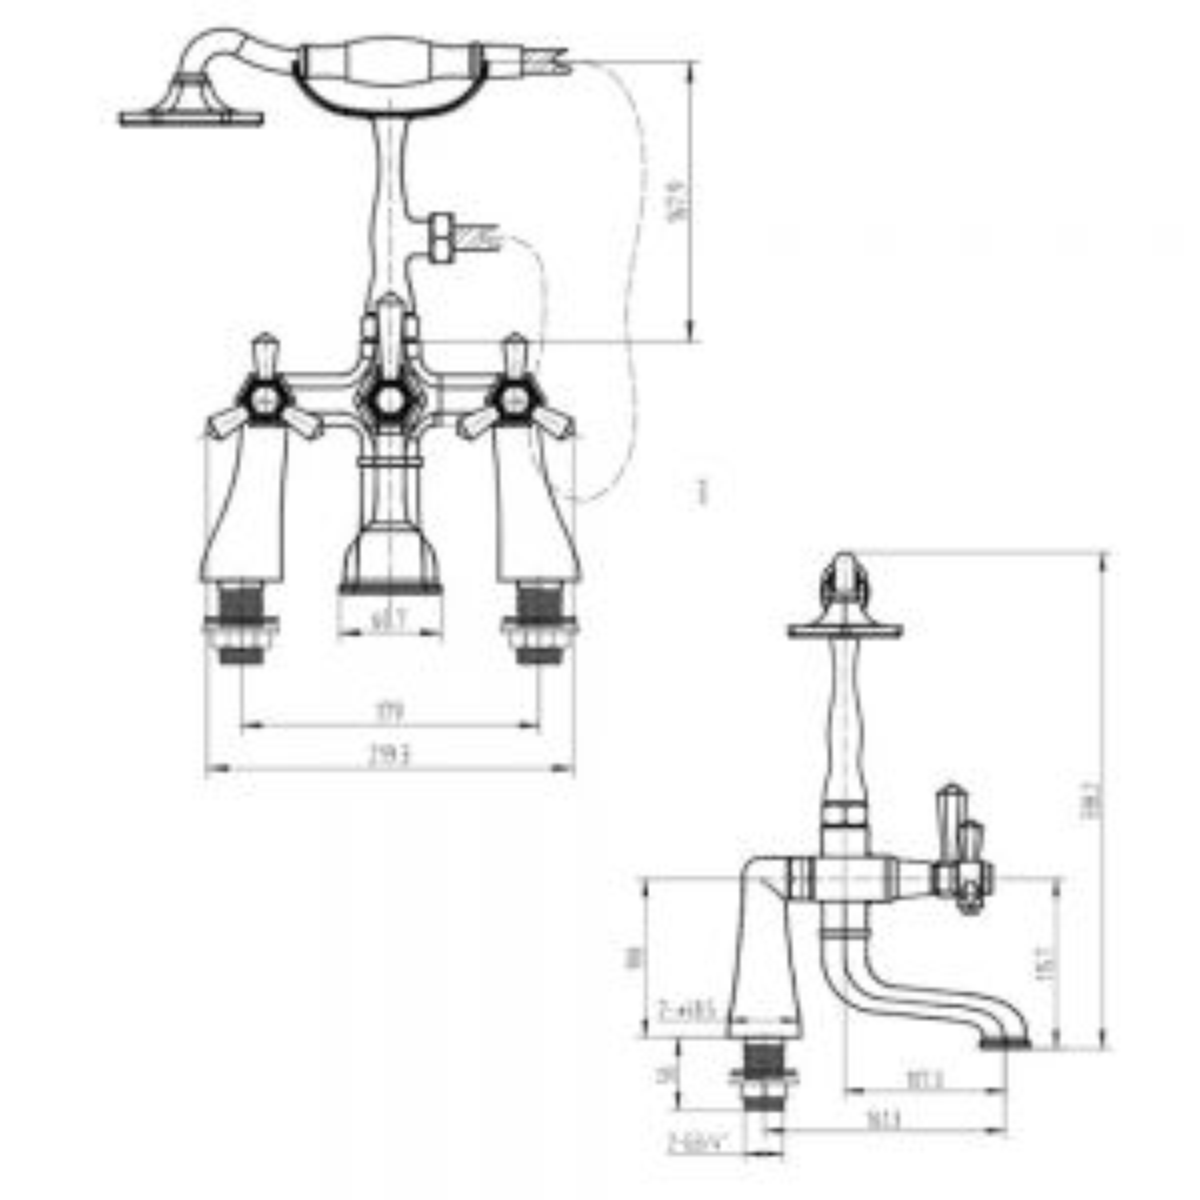 RAK Washington Chrome 2 Tap Hole Shower Bath Mixer Tap Measurements